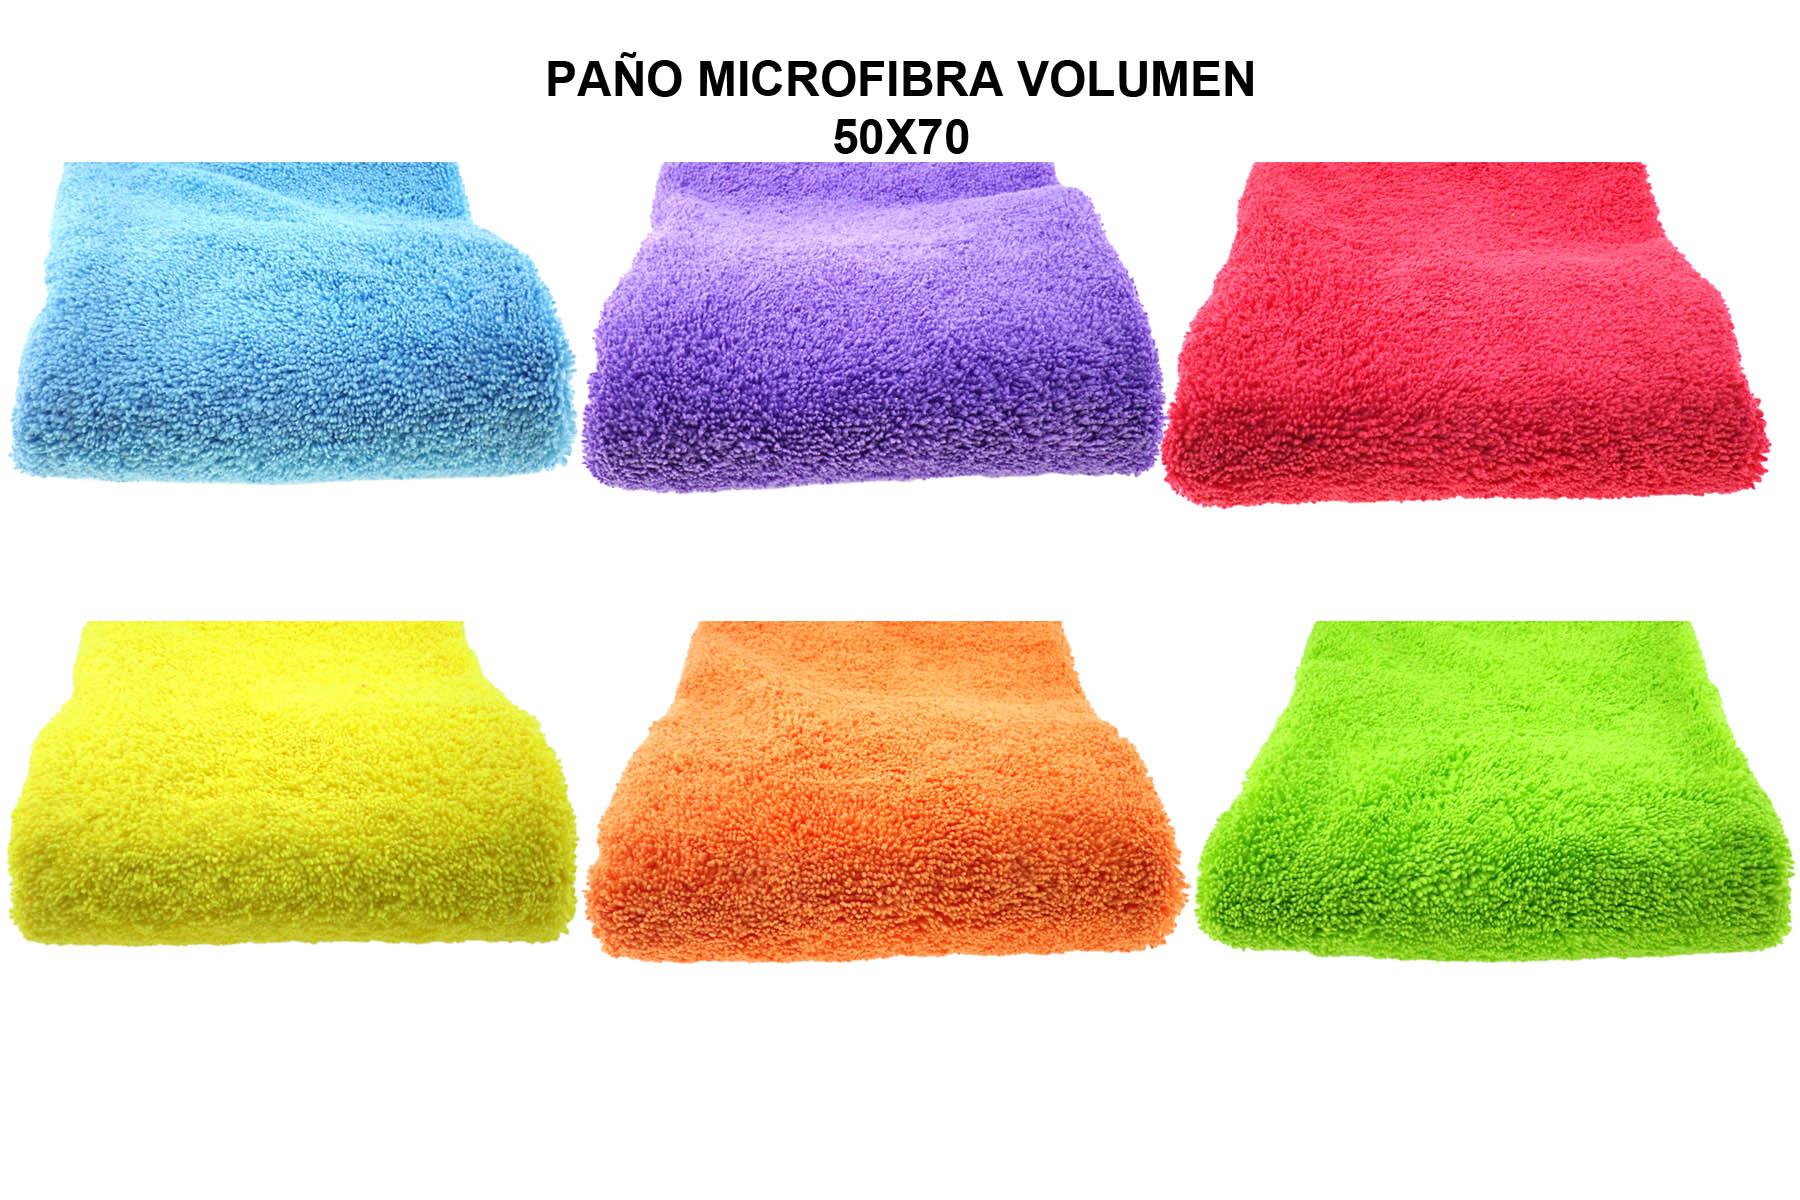 PAÑO MICROFIBRA VOLUMEN 50X70